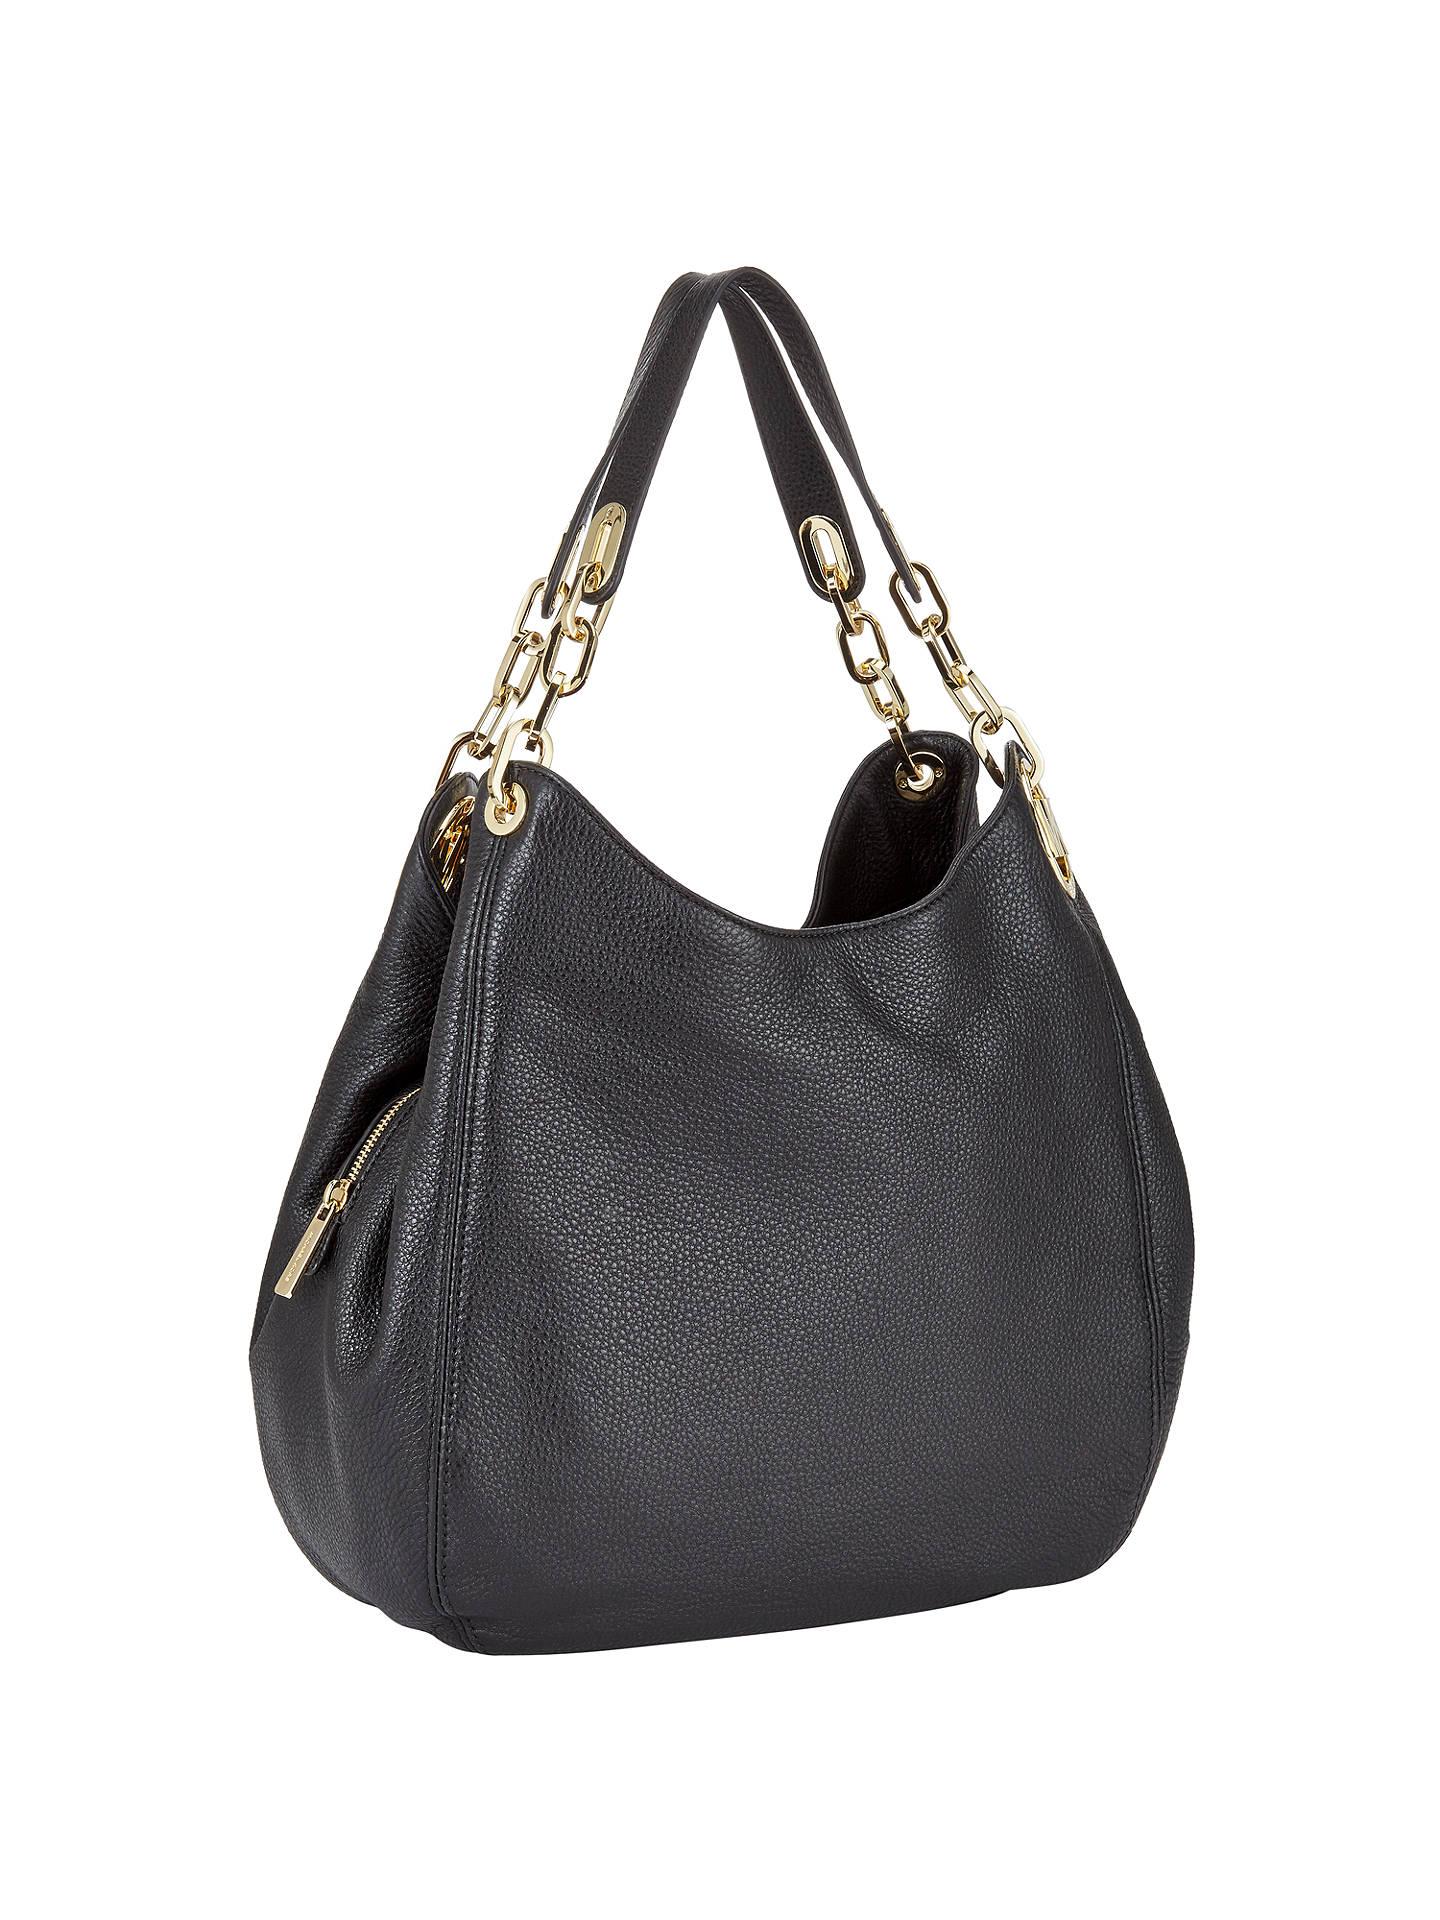 dc7c371d6b5 Buy MICHAEL Michael Kors Fulton Large Leather Shoulder Tote Bag, Black  Online at johnlewis.